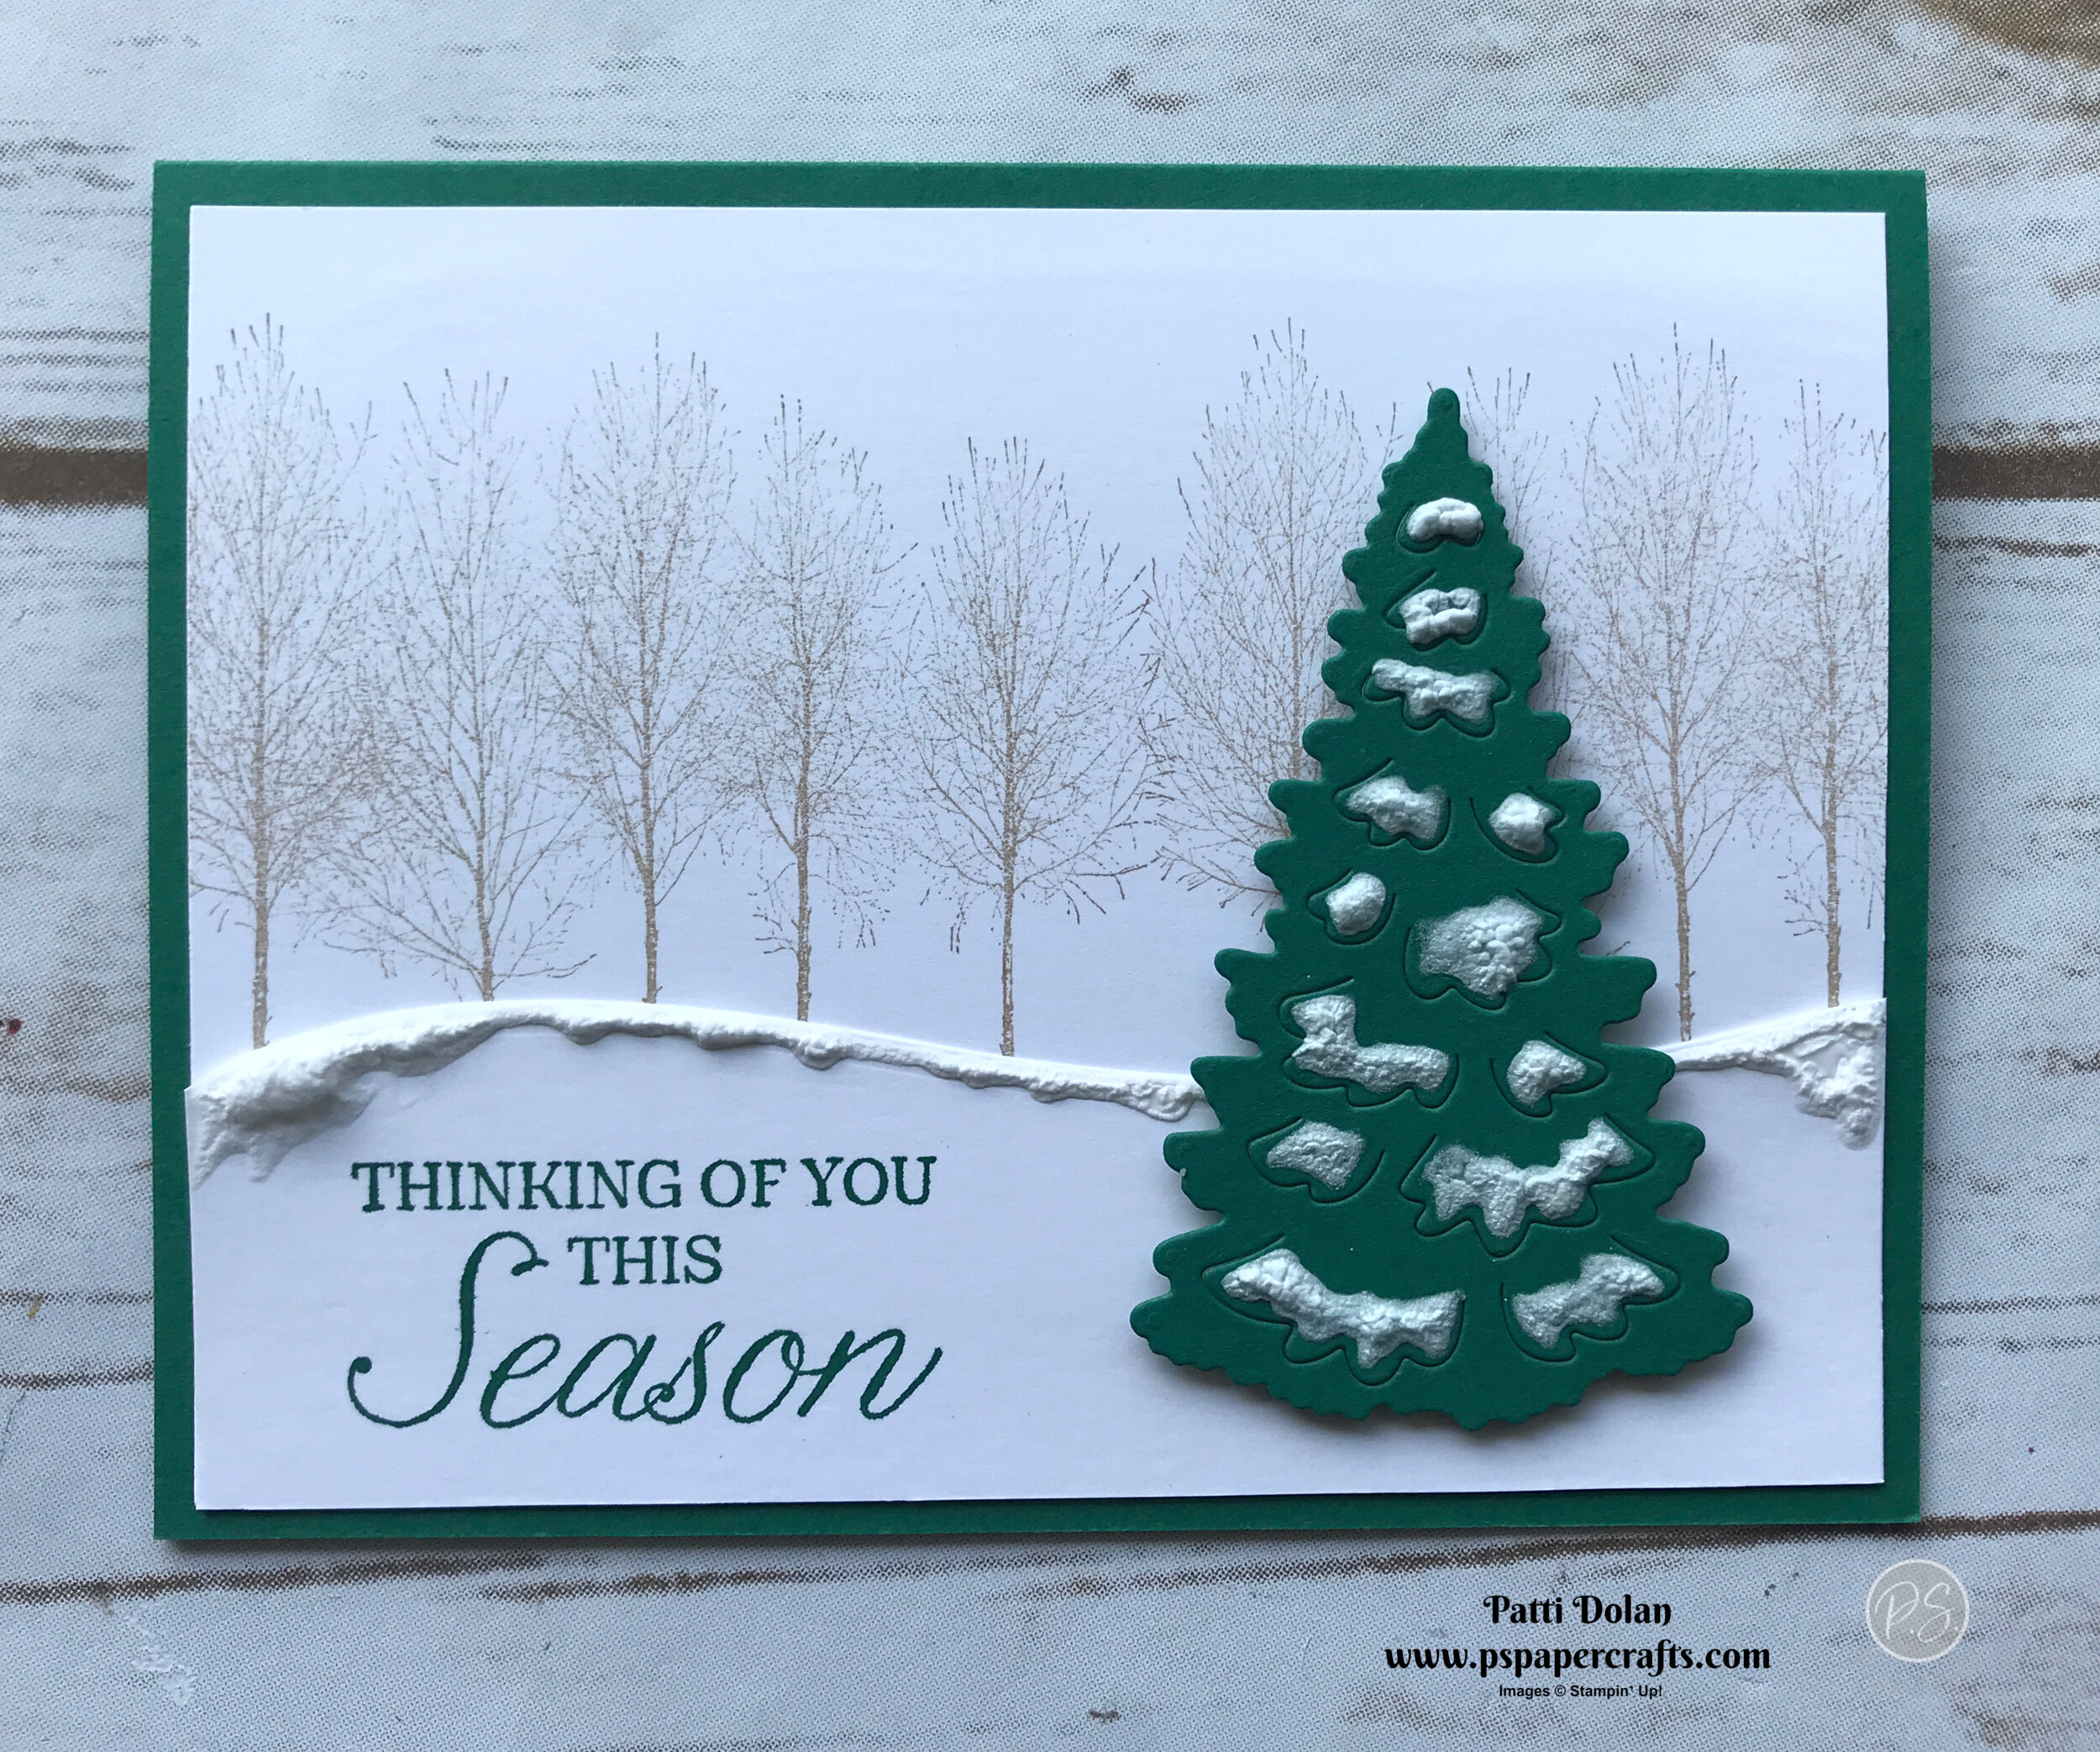 Winter Woods Snowy Christmas Card.jpg